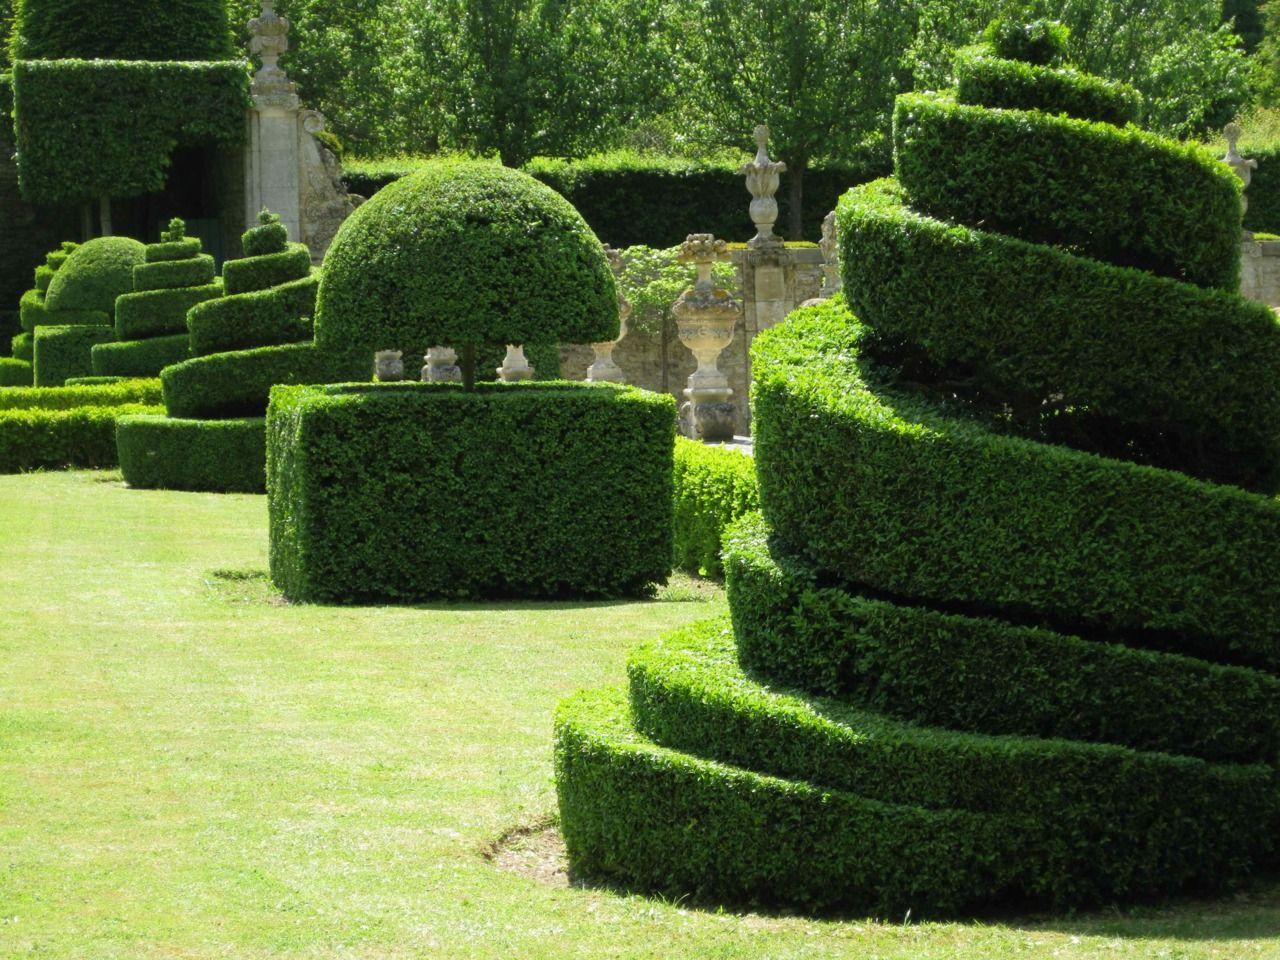 Le croissant d'argent | Topiary, Topiary garden, Garden